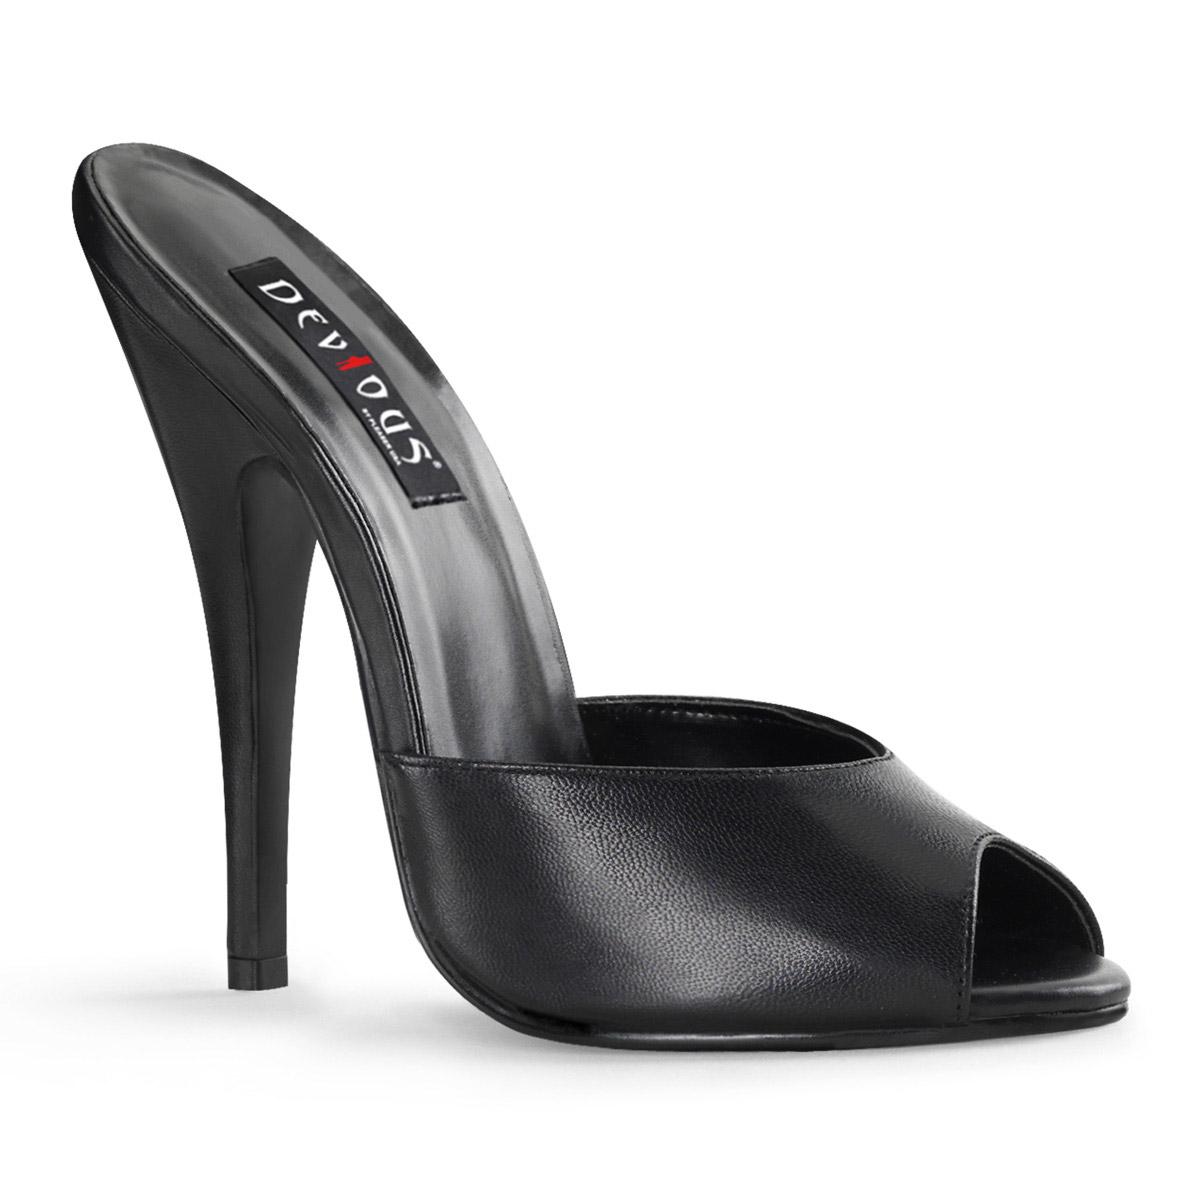 Pleaser 6  Peep Toe Toe Toe Mule Adult Women Sandals Blk Leather shoes e1a826